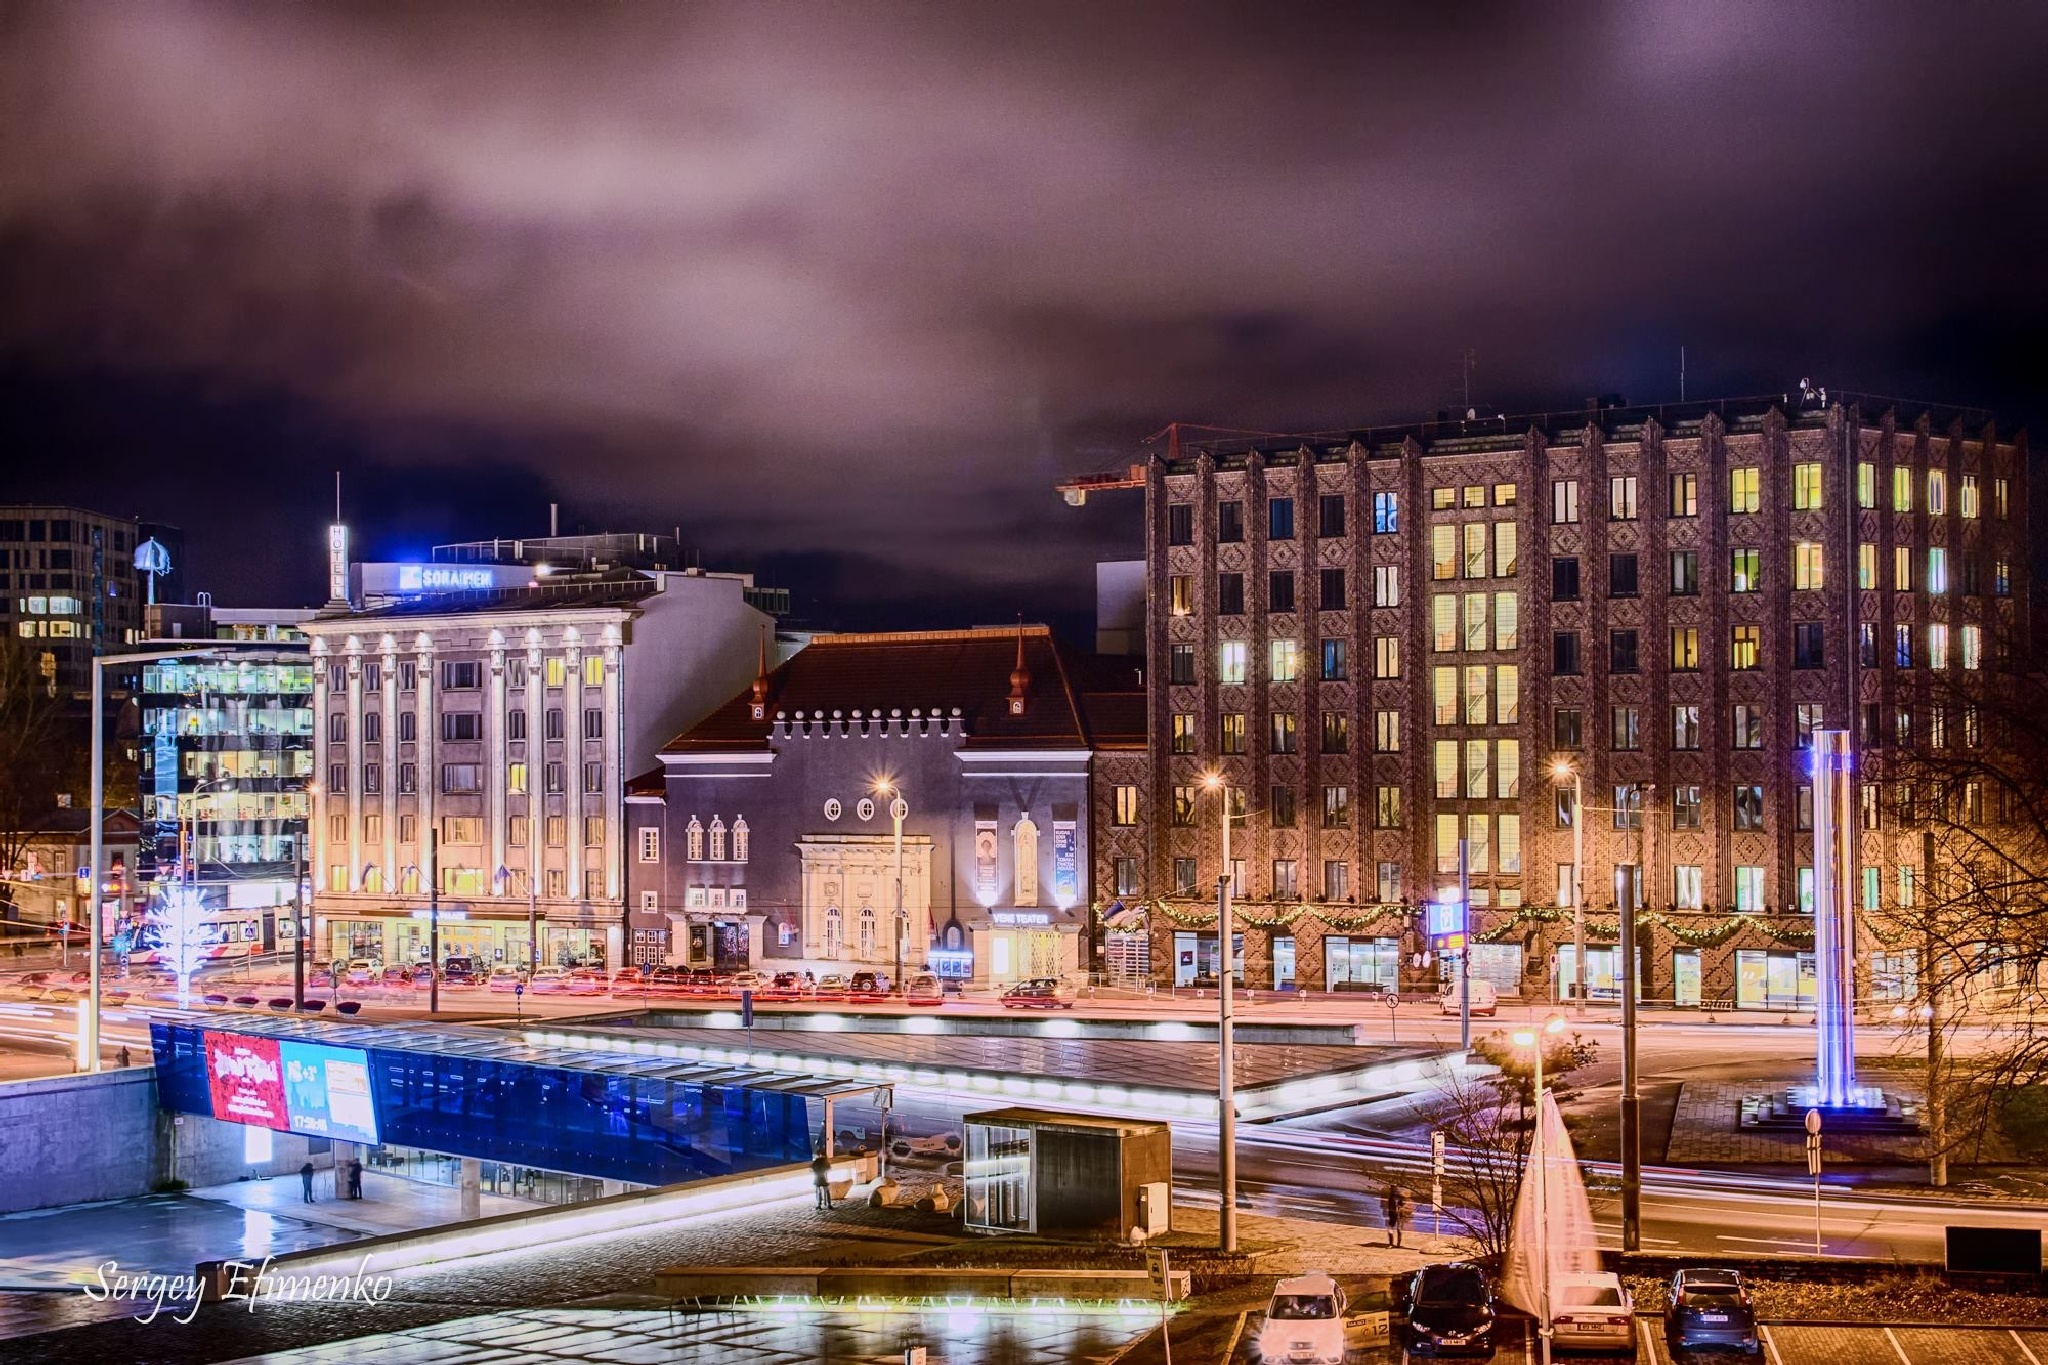 Talinn at night by Sergey Efimenko